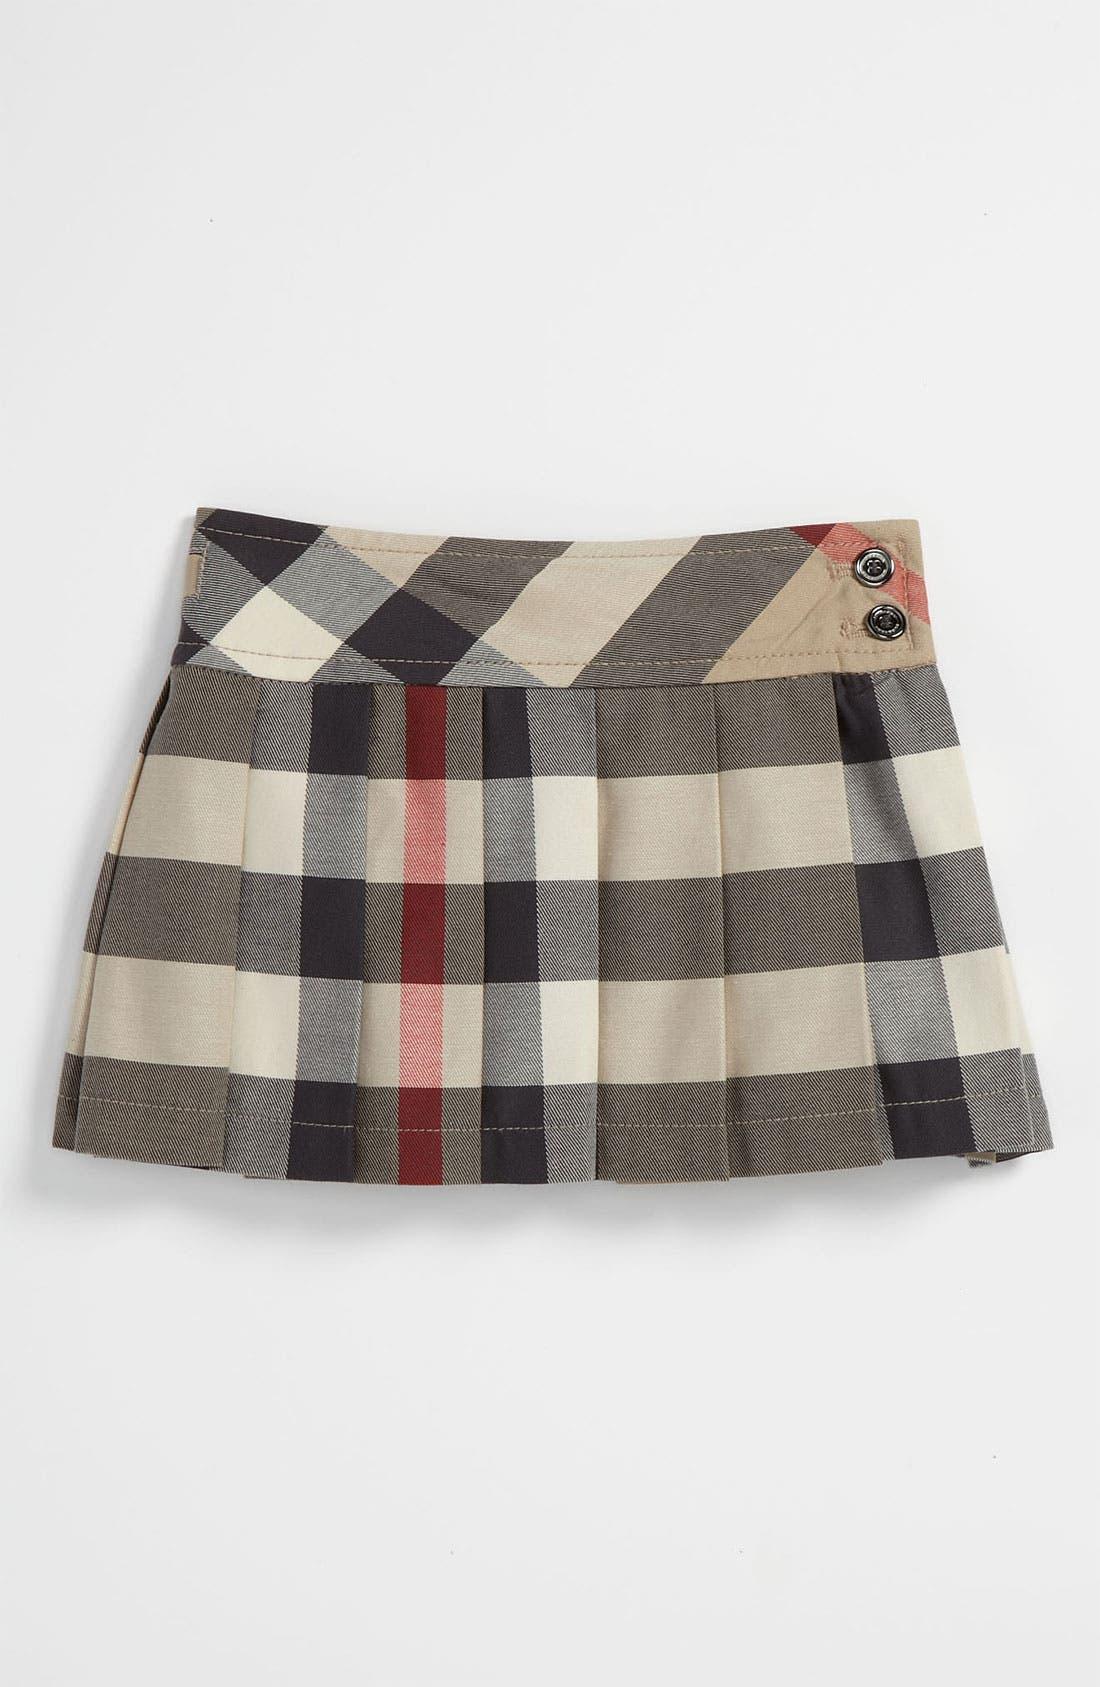 Main Image - Burberry Check Print Skirt (Toddler)